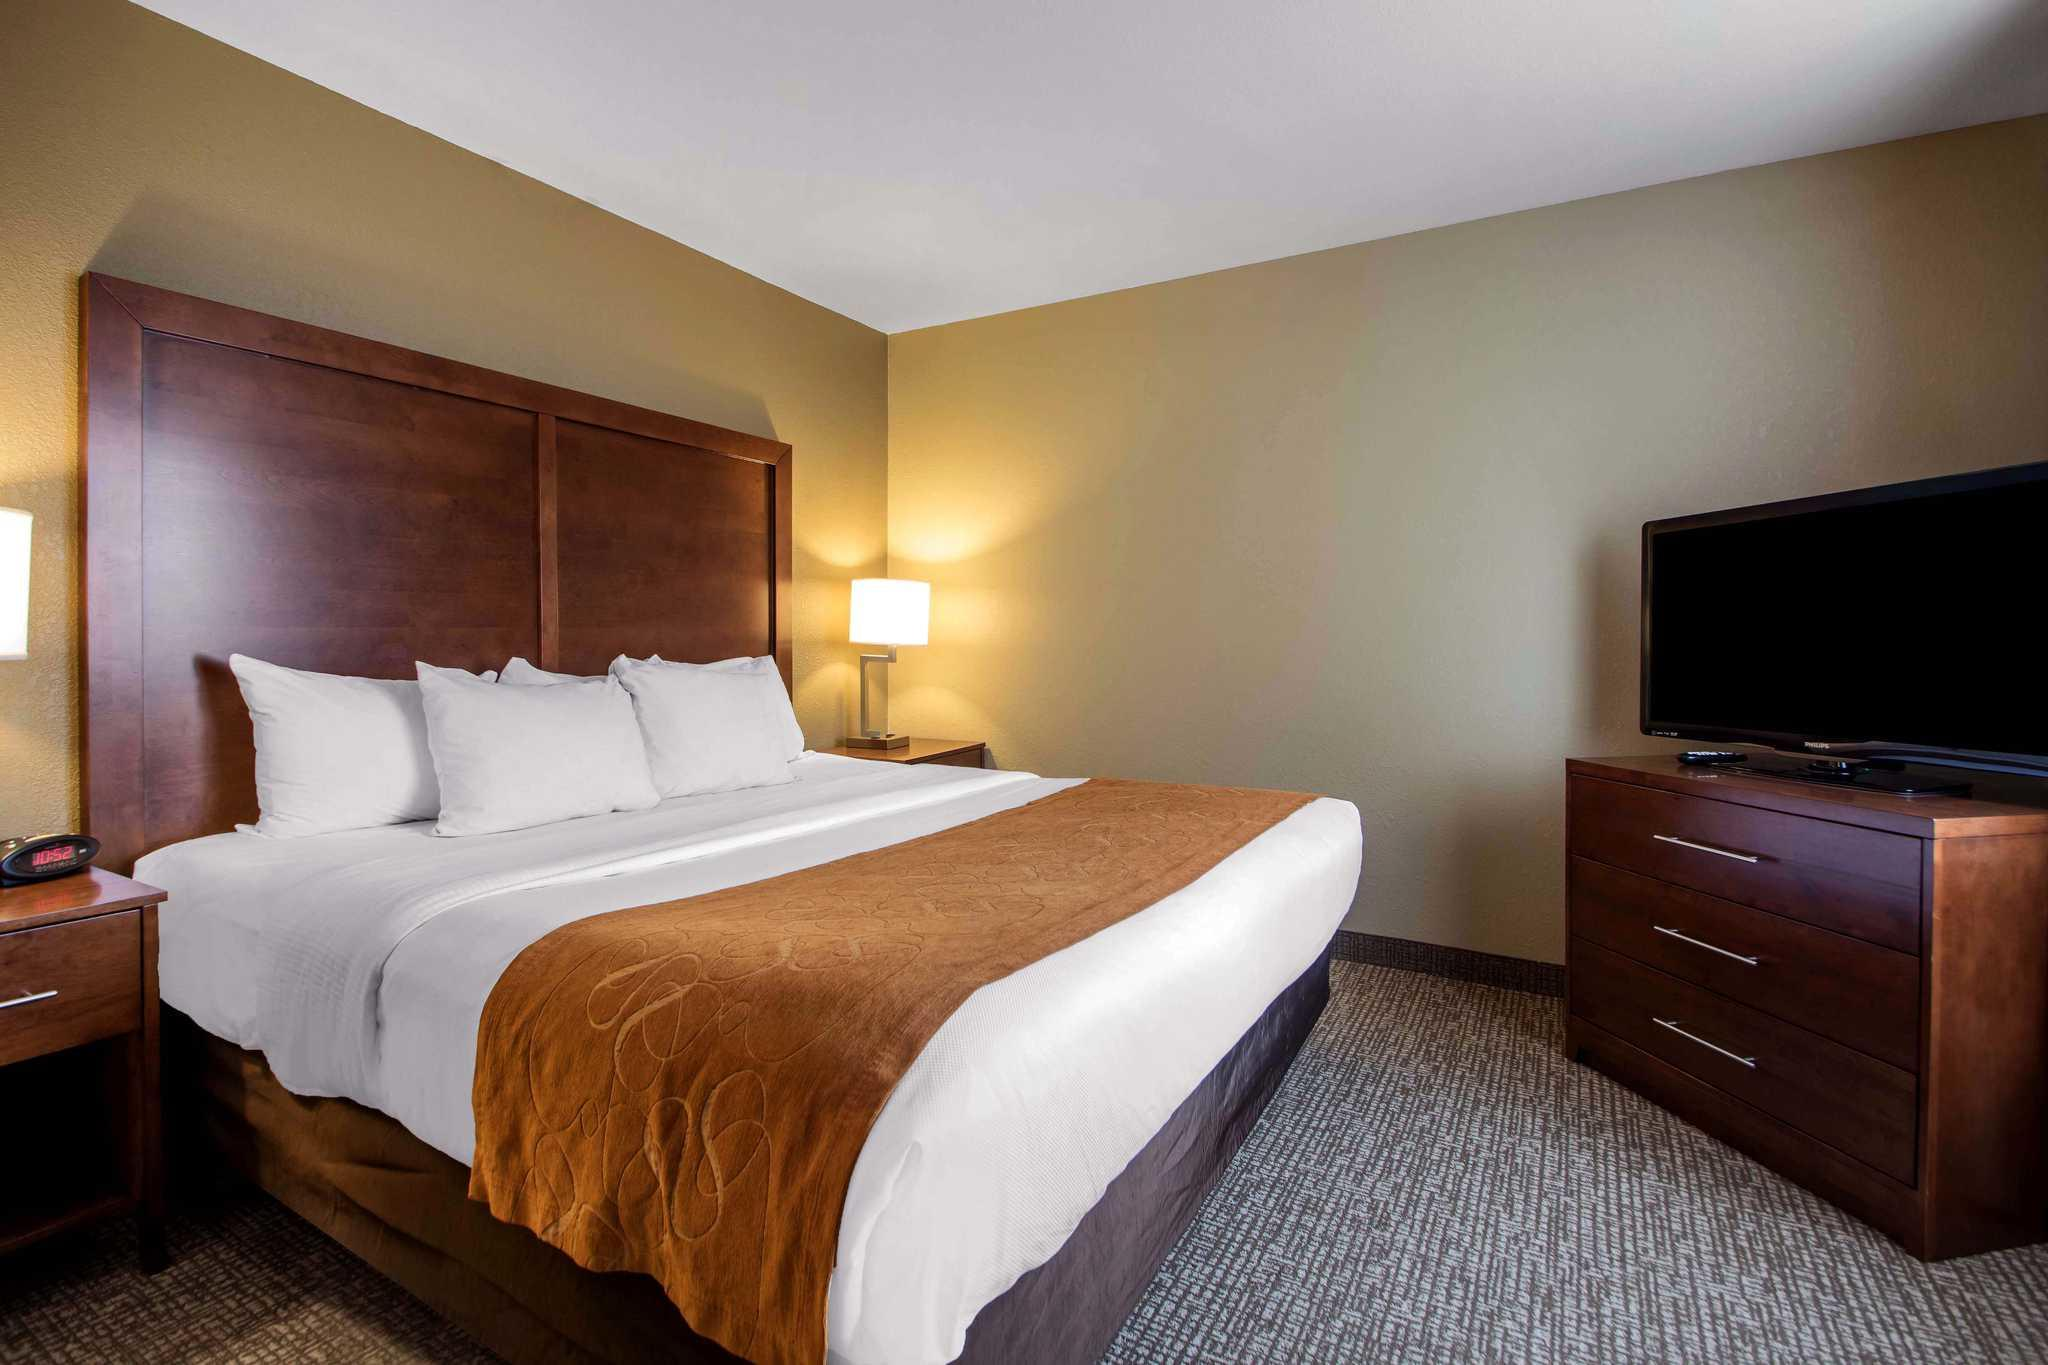 Comfort Suites Johnson Creek Conference Center image 13